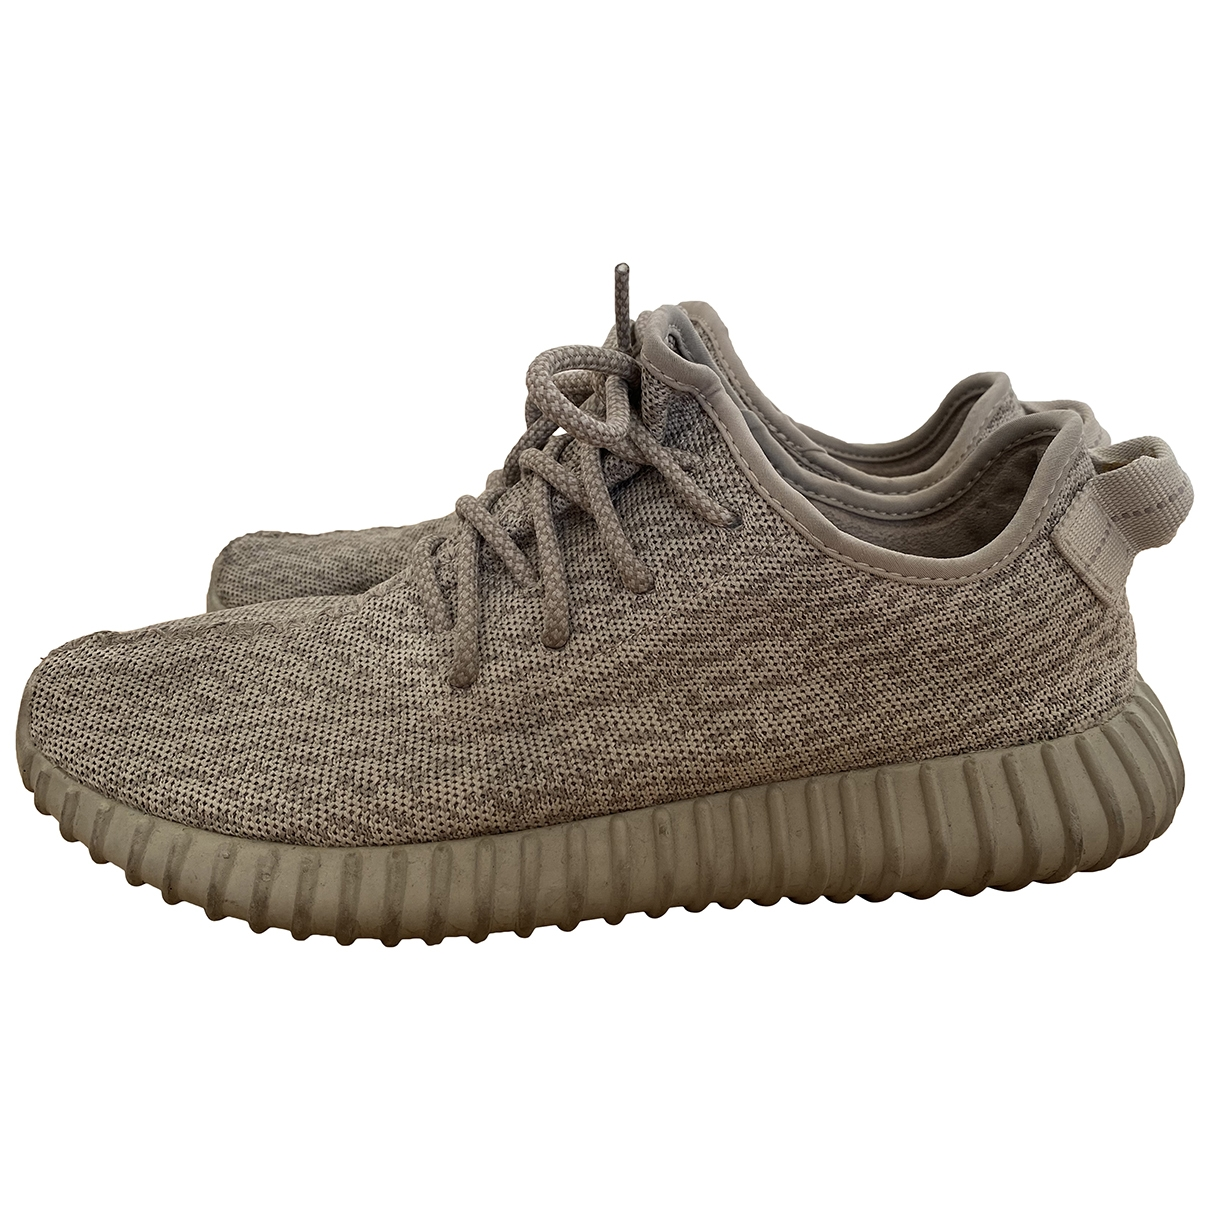 Yeezy X Adidas - Baskets Boost 350 V1 pour homme en toile - gris